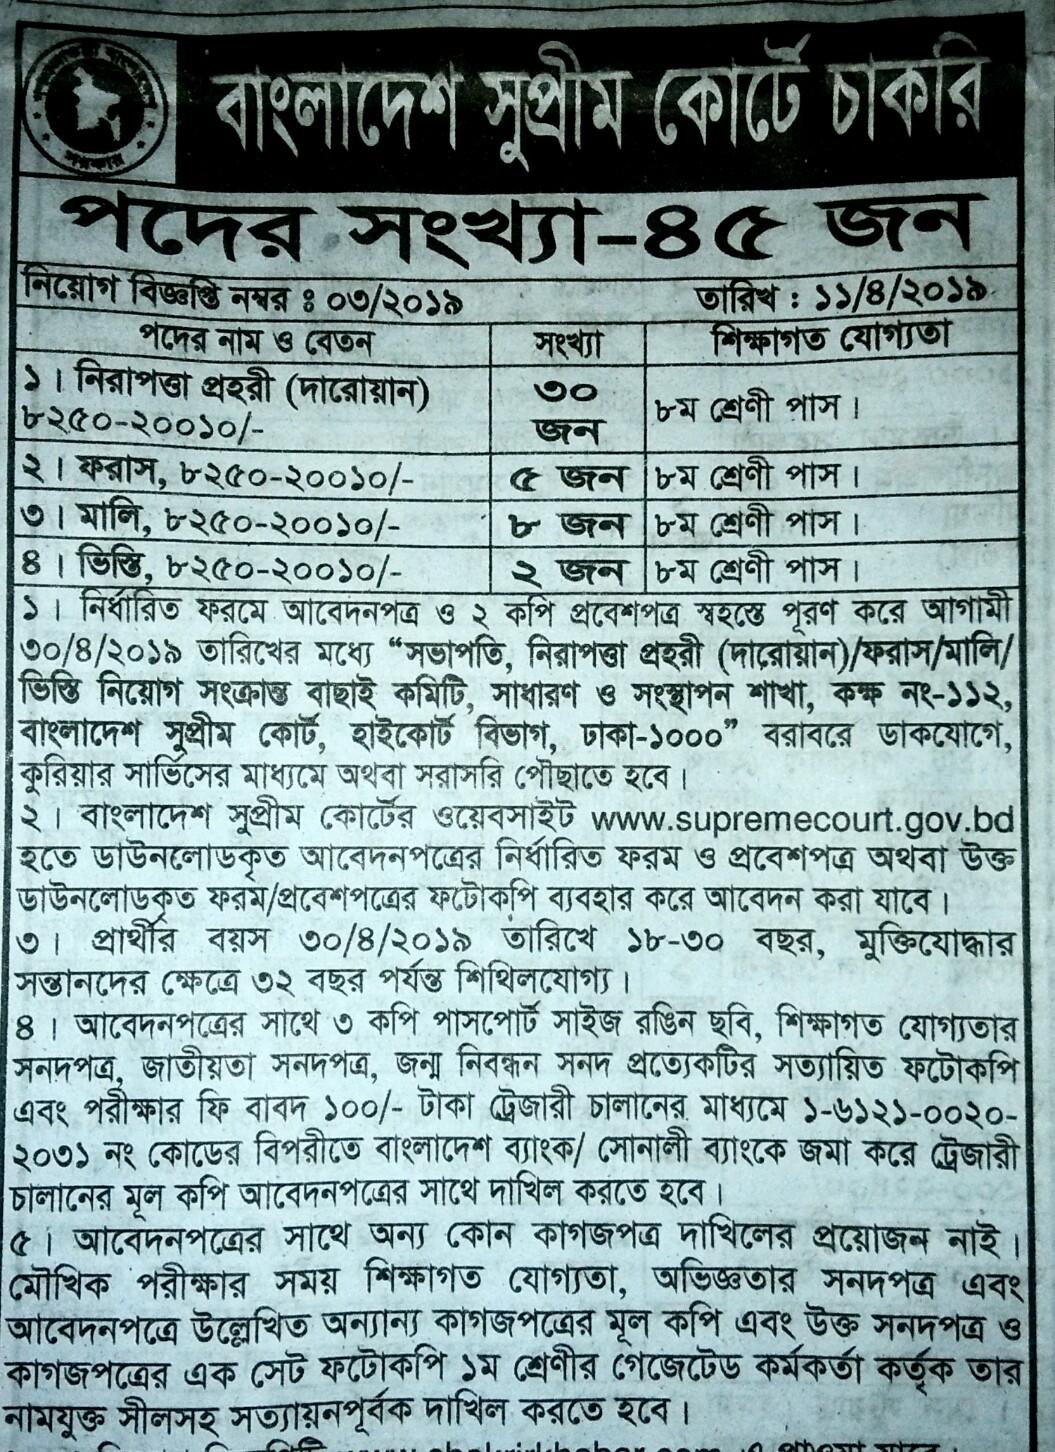 Bangladesh supremecourt job circular 2019. বাংলাদেশ সুপ্রিম কোর্ট নিয়োগ বিজ্ঞপ্তি ২০১৯